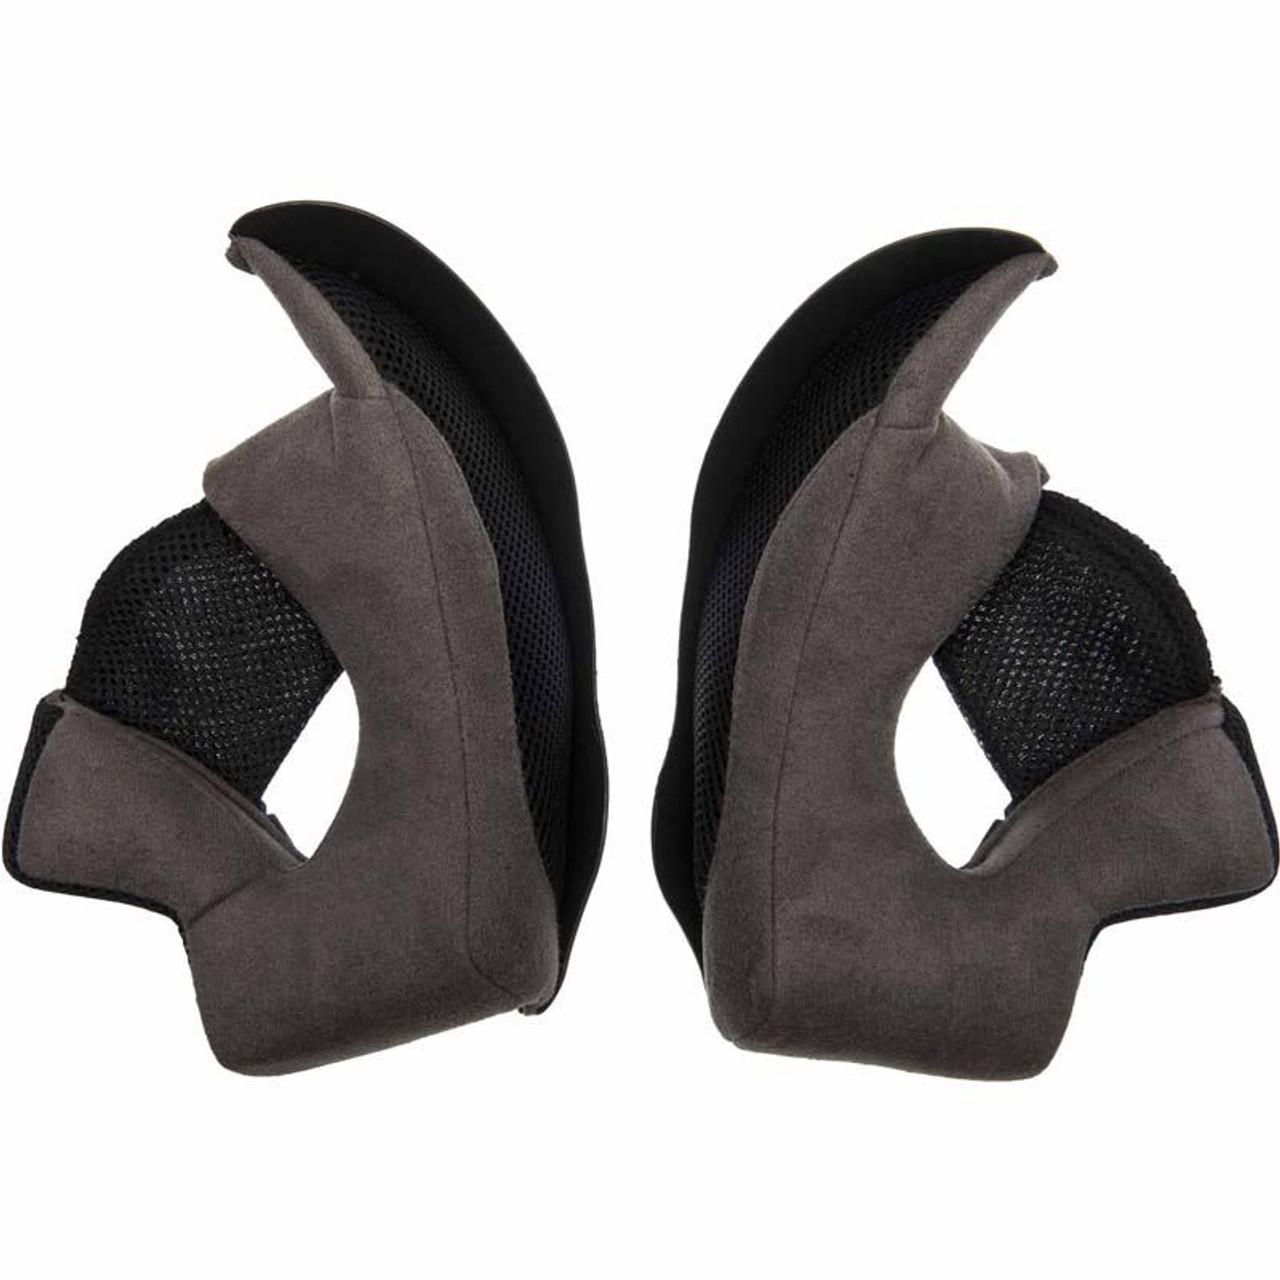 Grey Bell Qualifier Helmet Replacement Cheek Pads